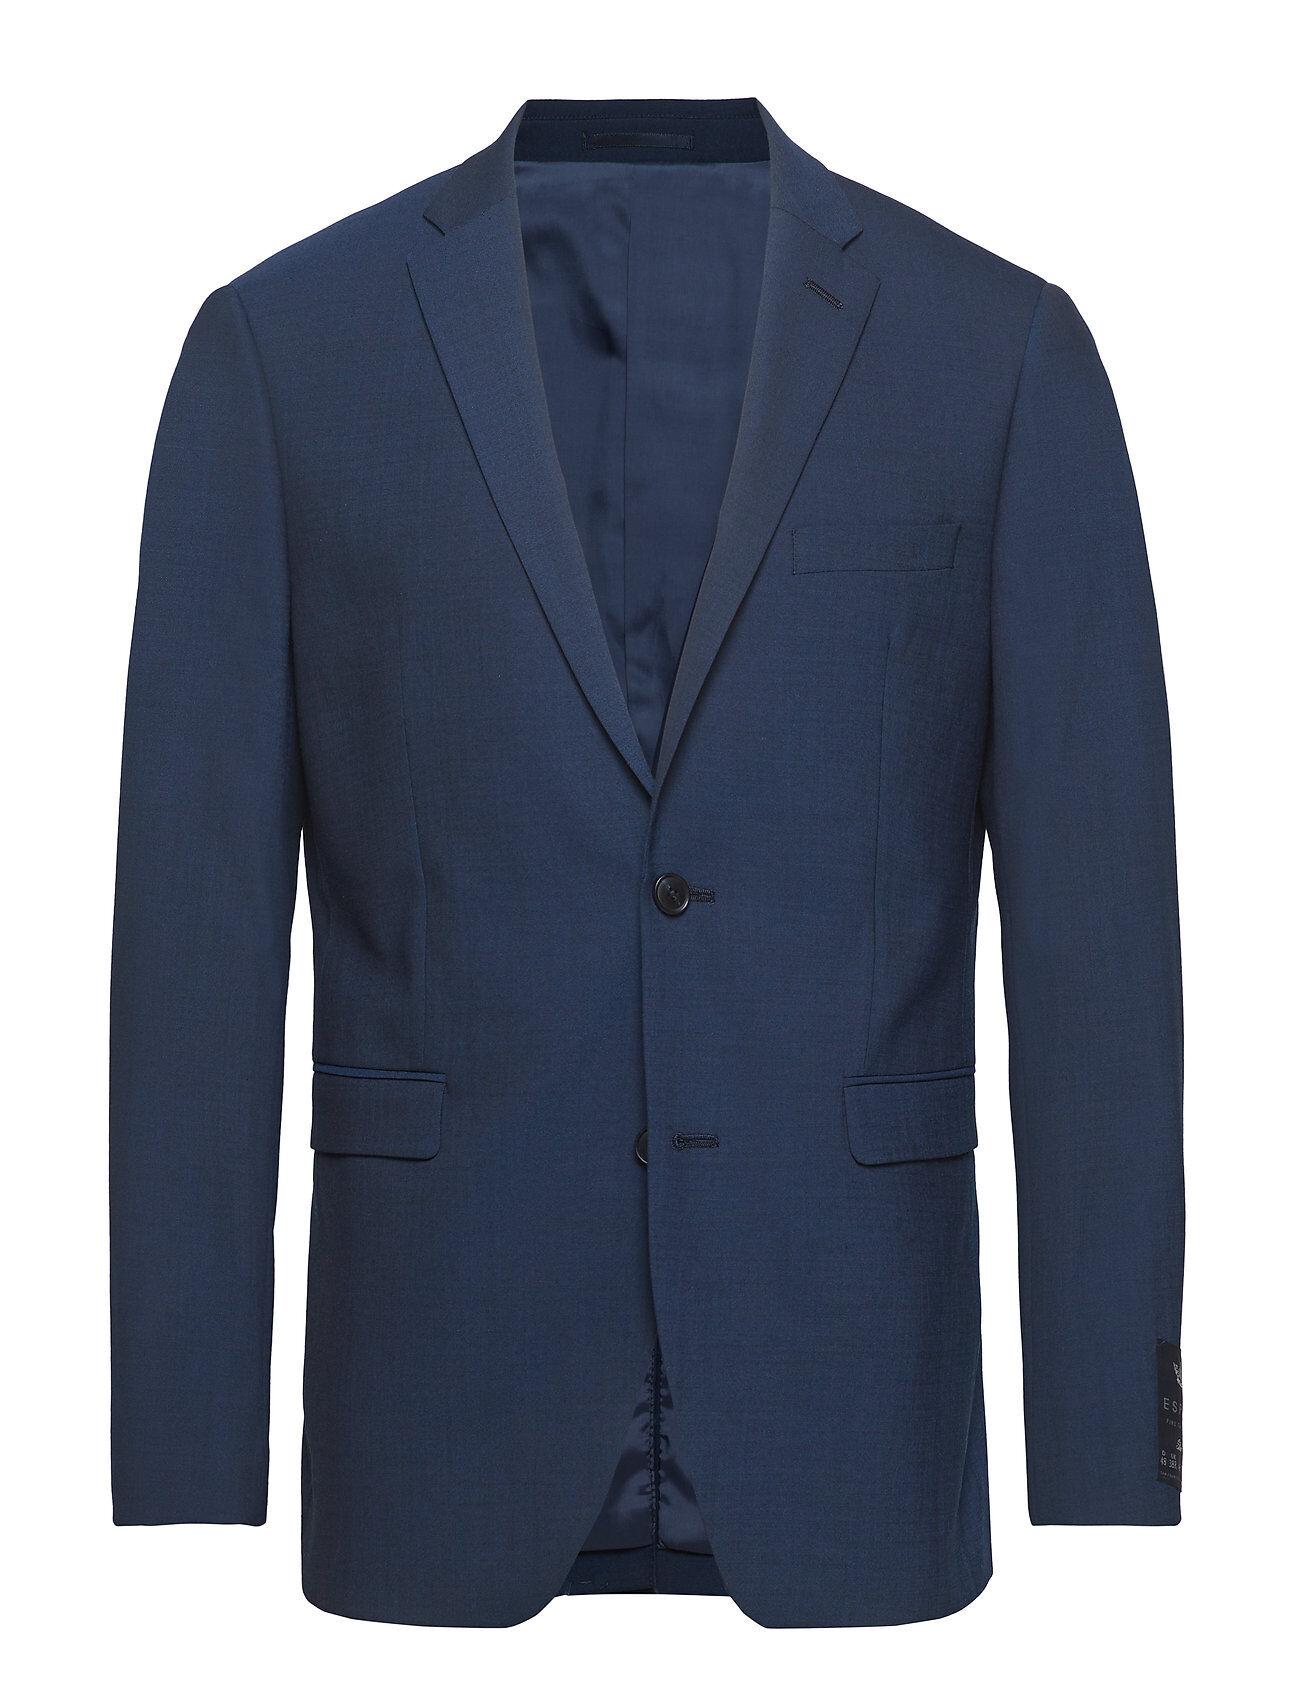 Image of Esprit Collection Blazers Suit Bleiseri Puvun Takki Sininen Esprit Collection